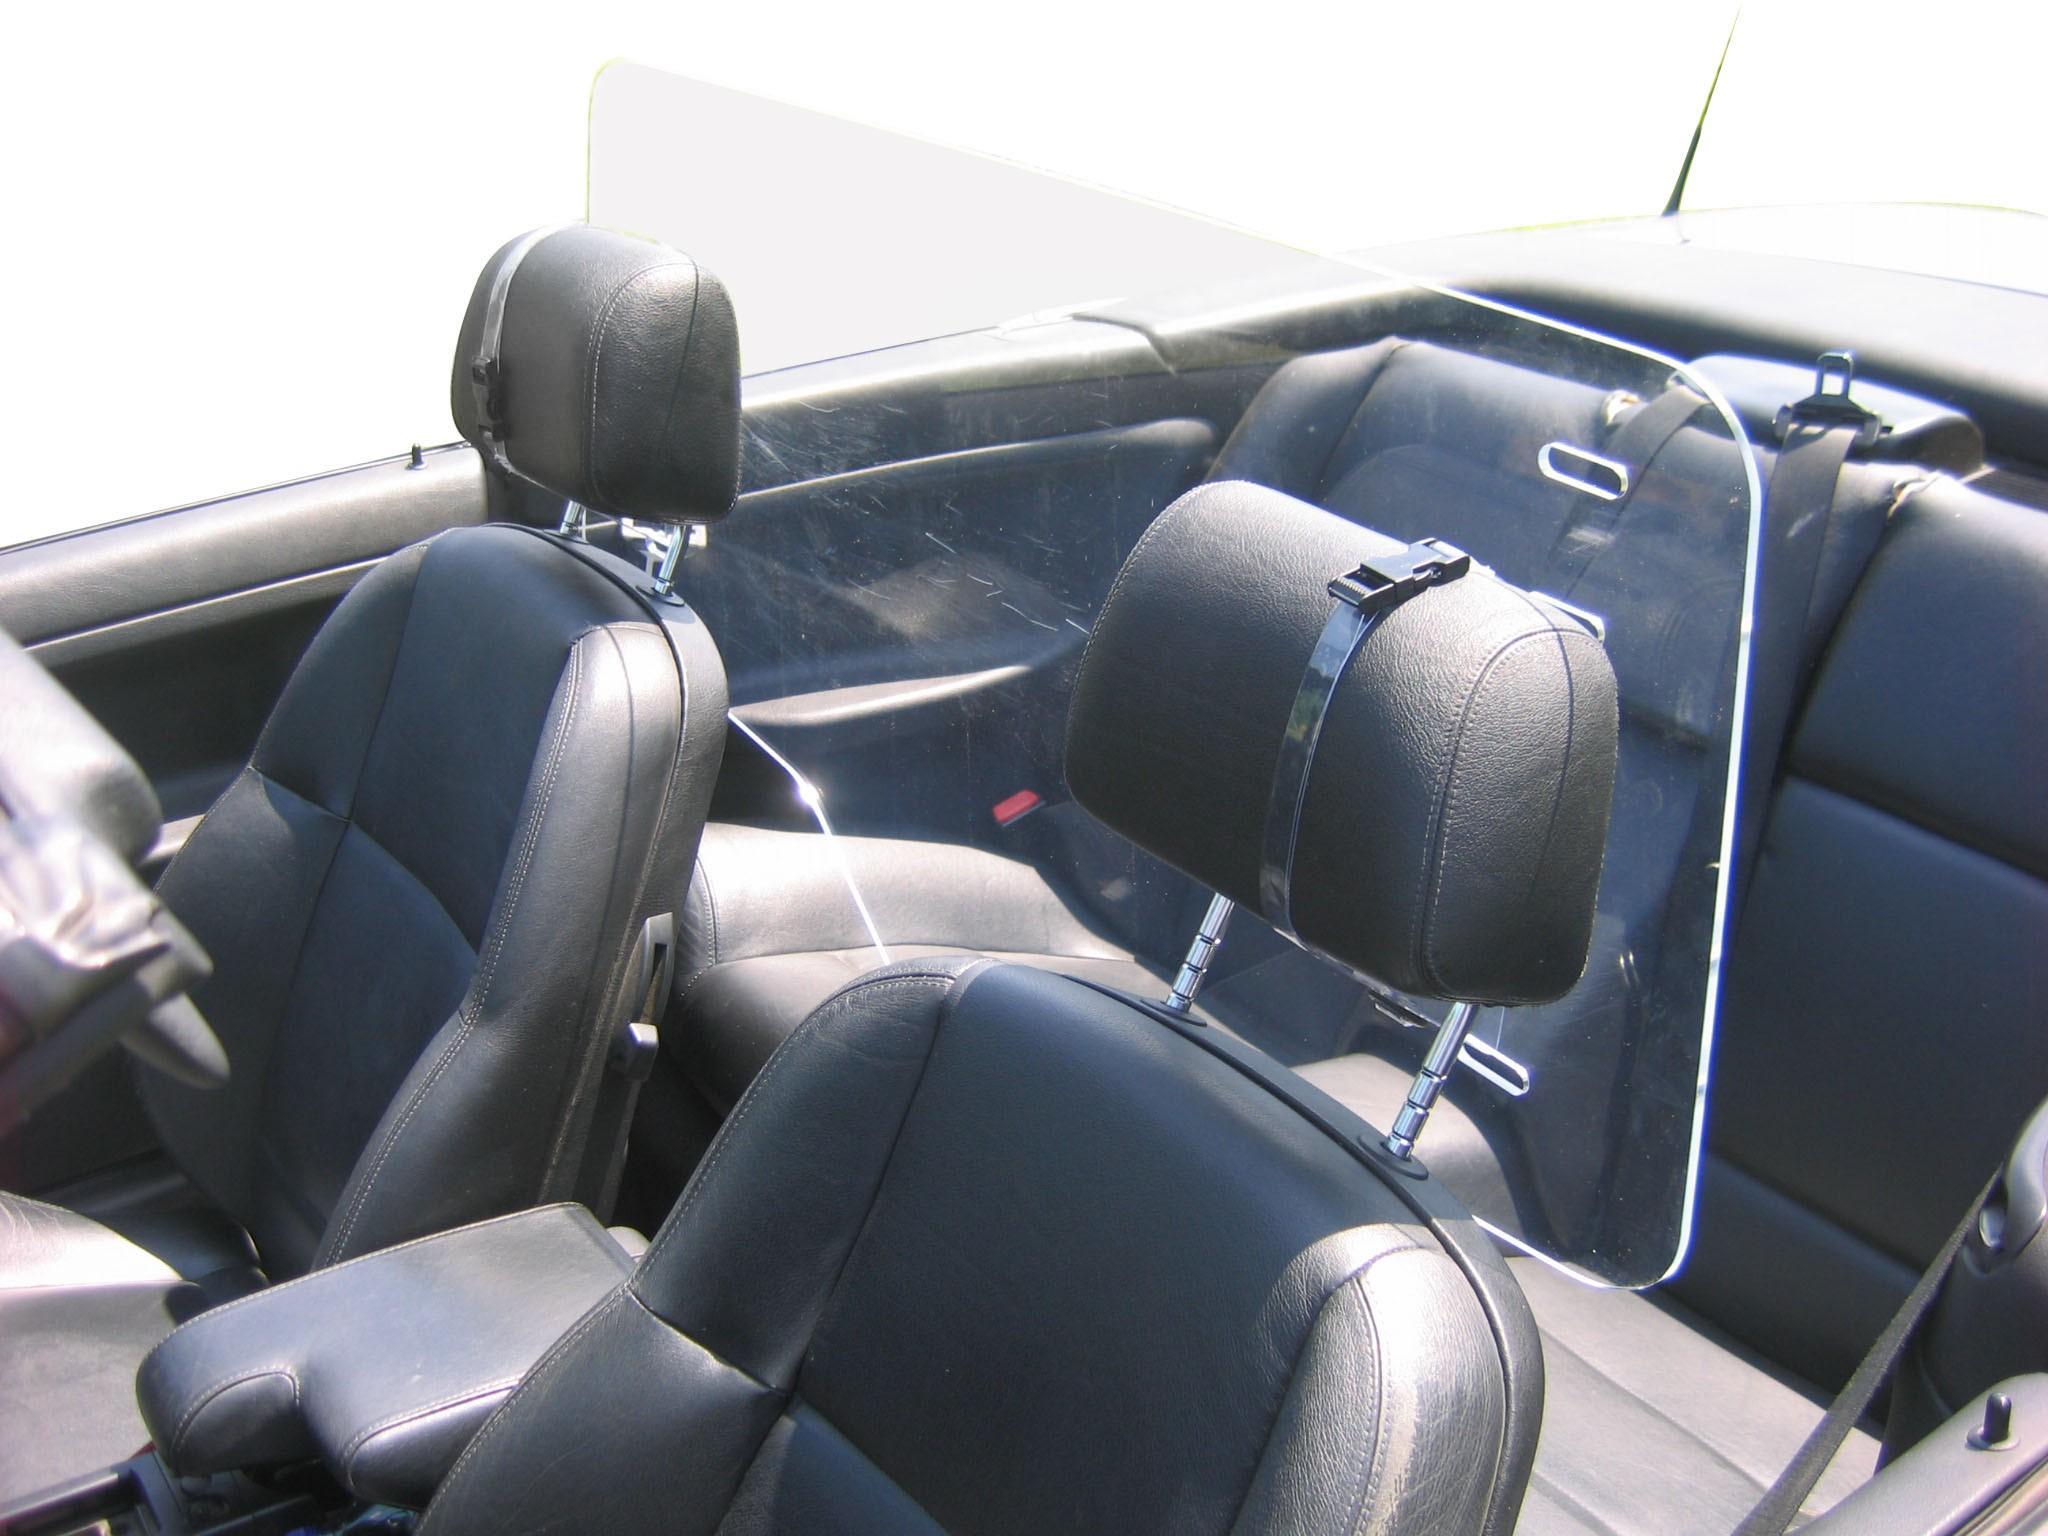 Peugeot 206 Large